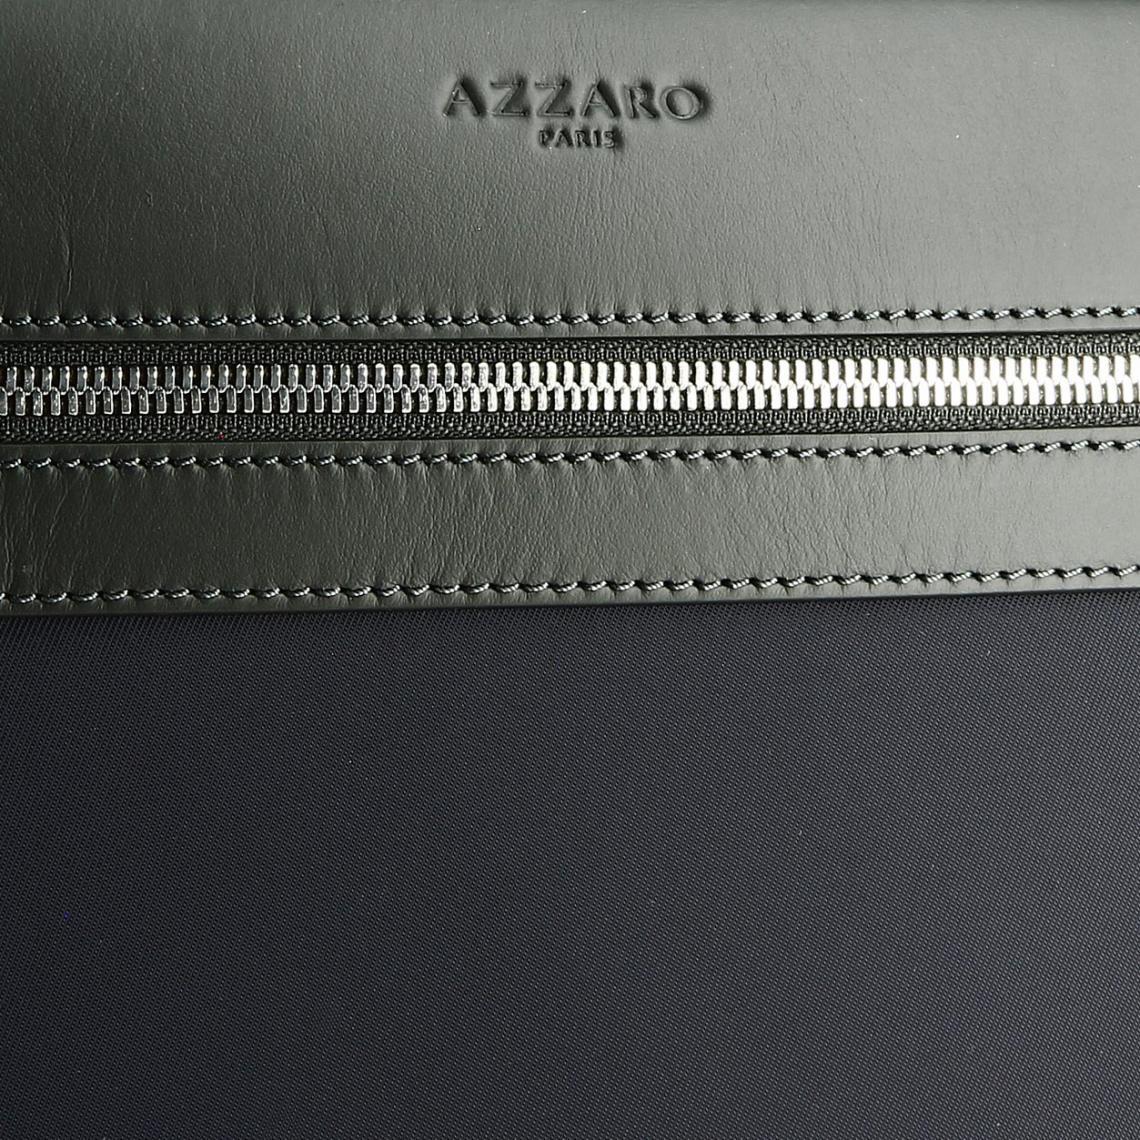 AZZARO maroquinerie